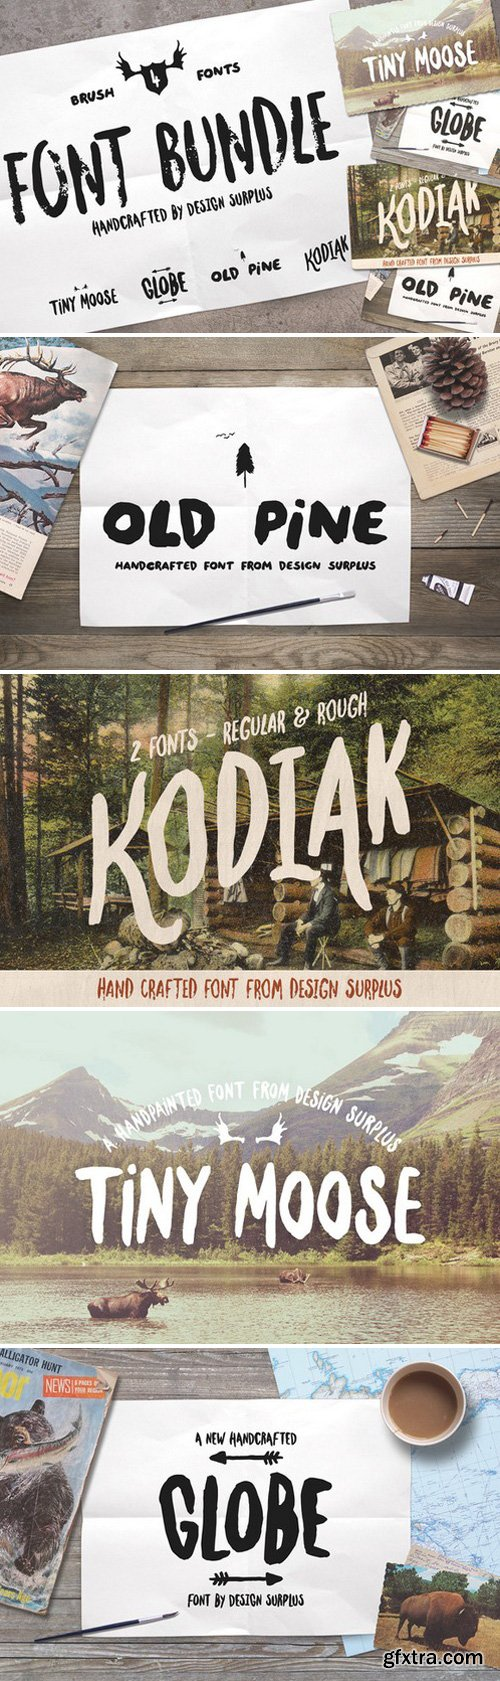 CM - Font Bundle Tiny Moose Old Pine & Old Pine Extras Globe Kodiak Regular & Kodiak Rough 279235